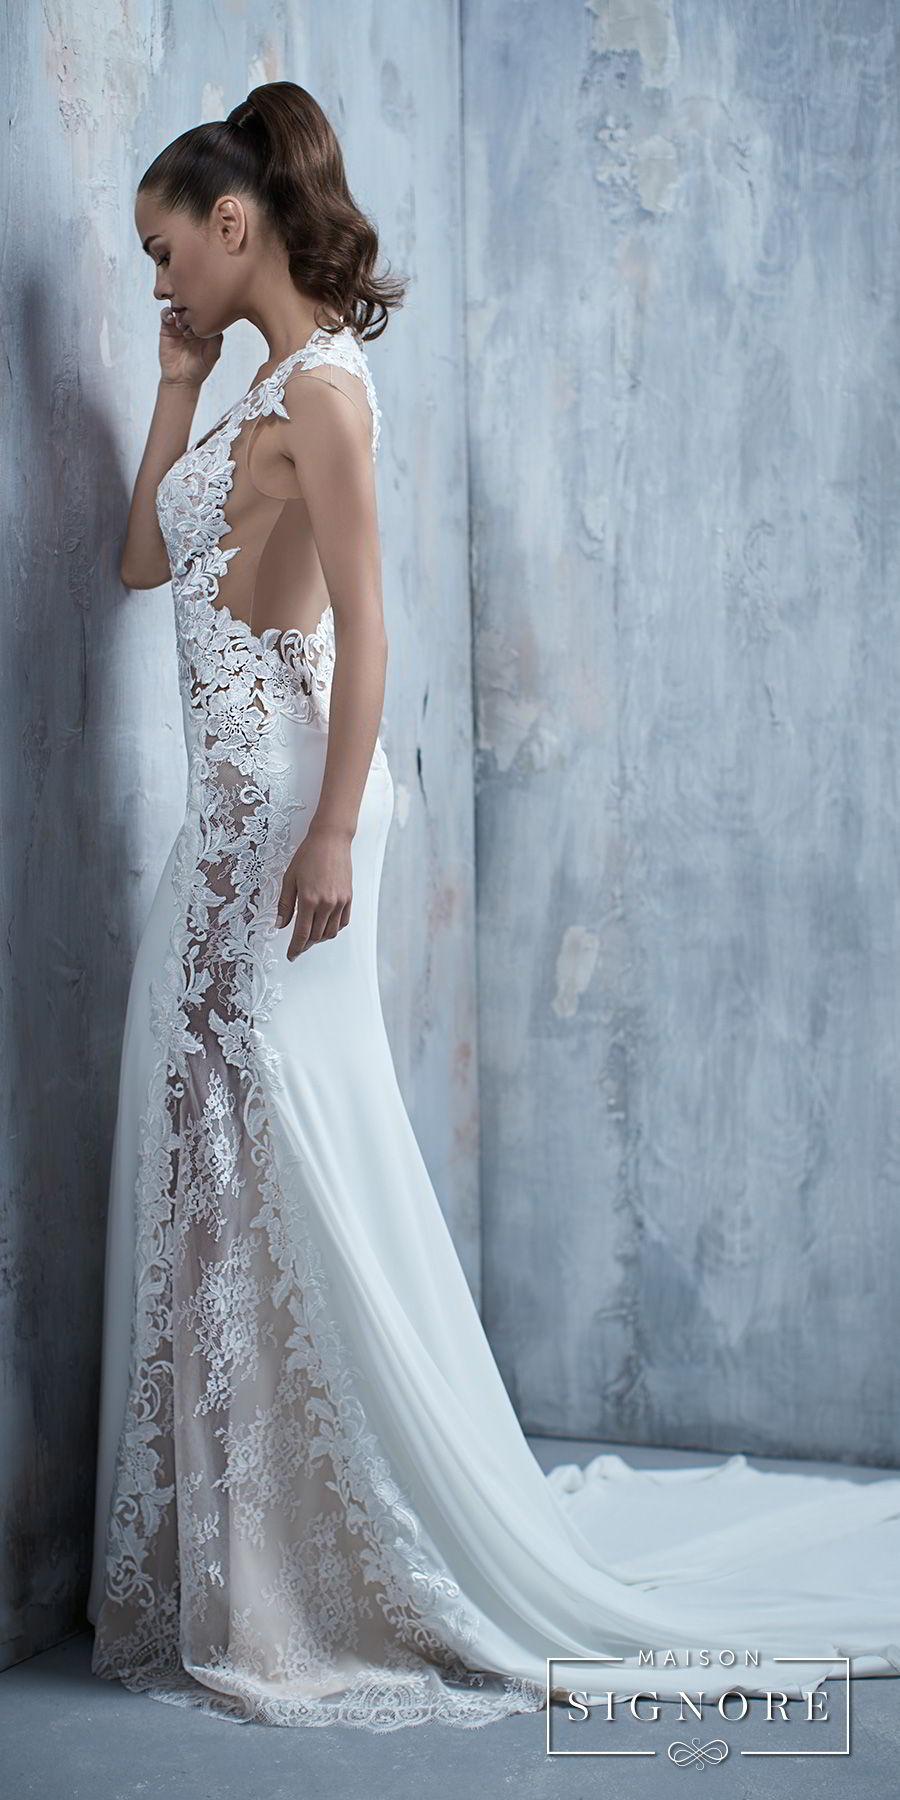 maison signore 2018 bridal cap sleeves deep v neck heavily embellished elegant fit and flare wedding dress chapel train (tessa) sdv